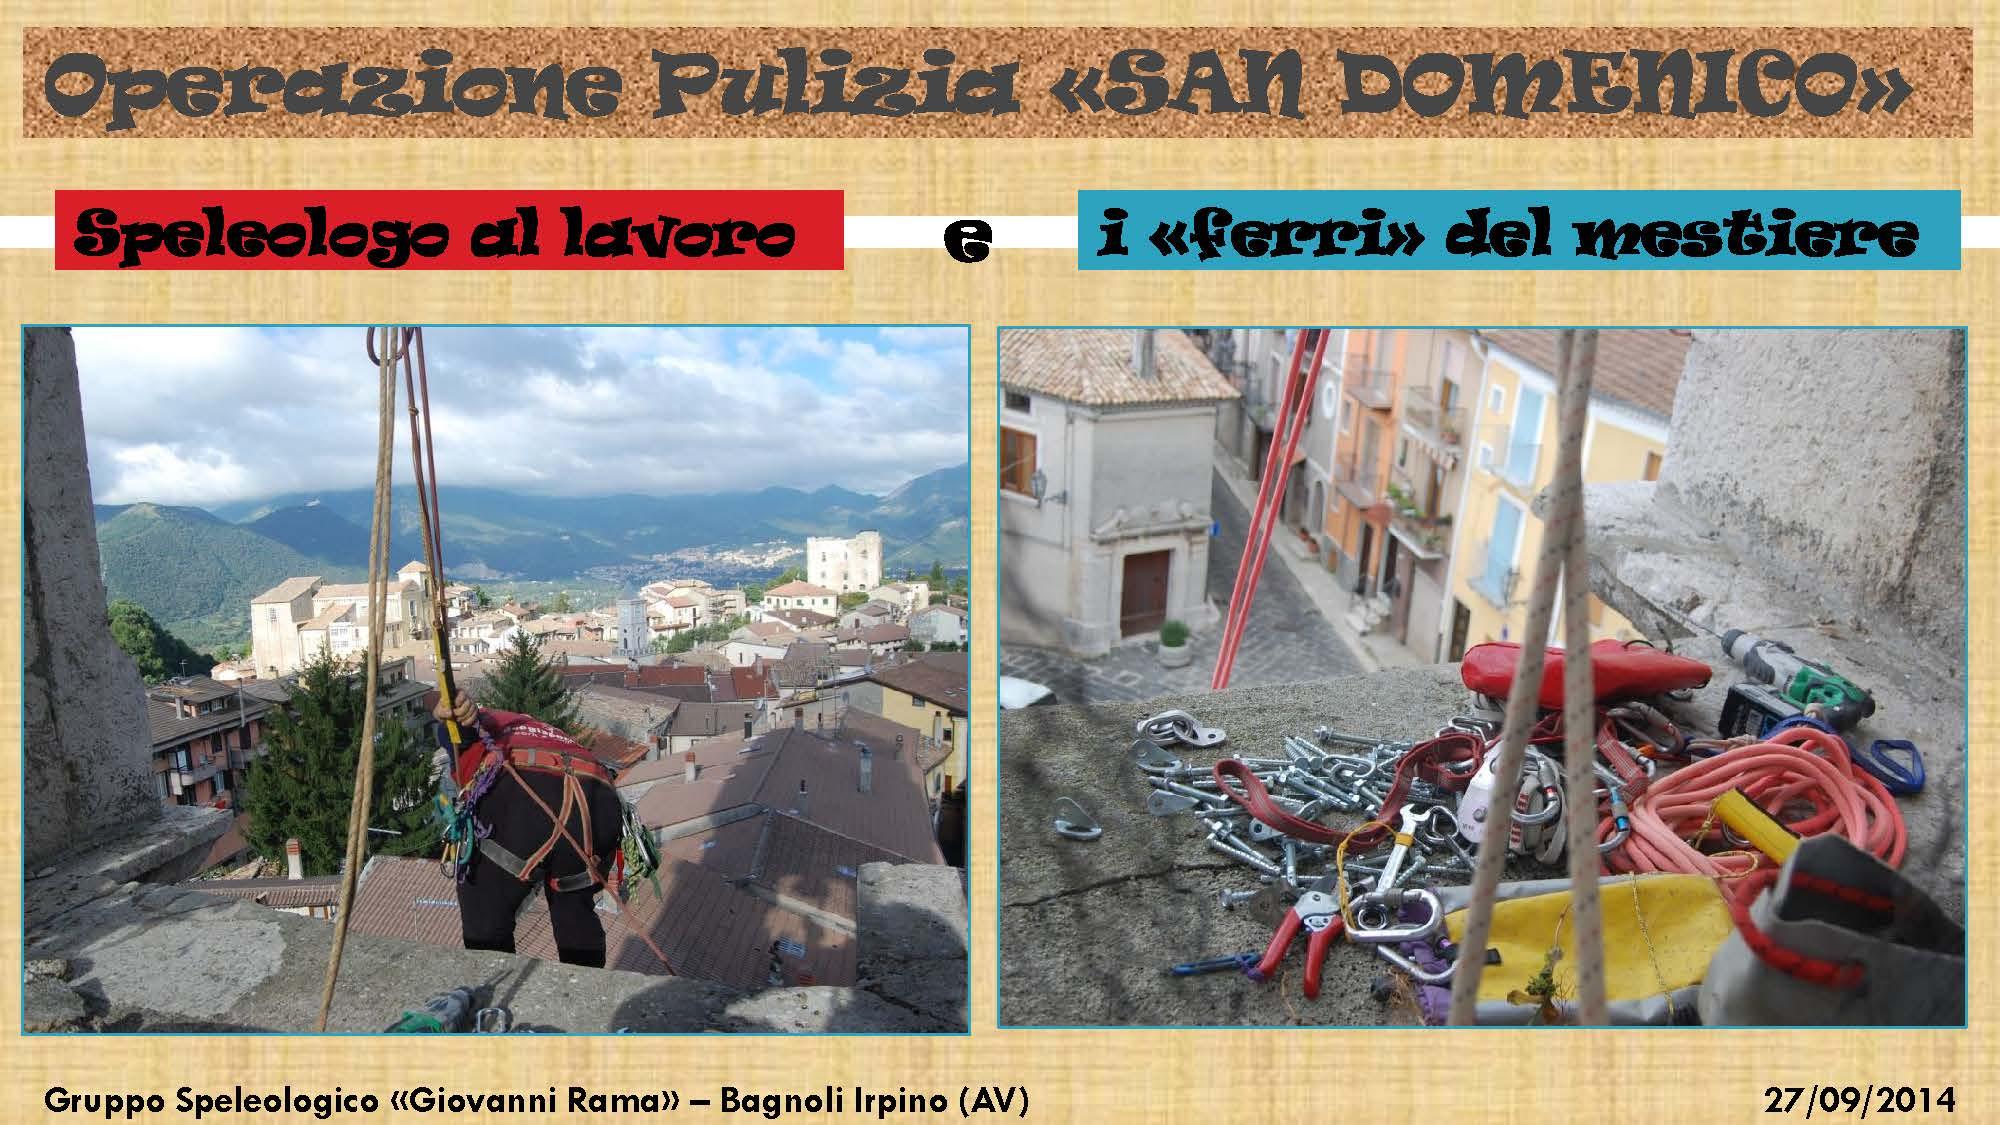 Bagnoli-Pulizia-San-Domenico-2014_Pagina_15